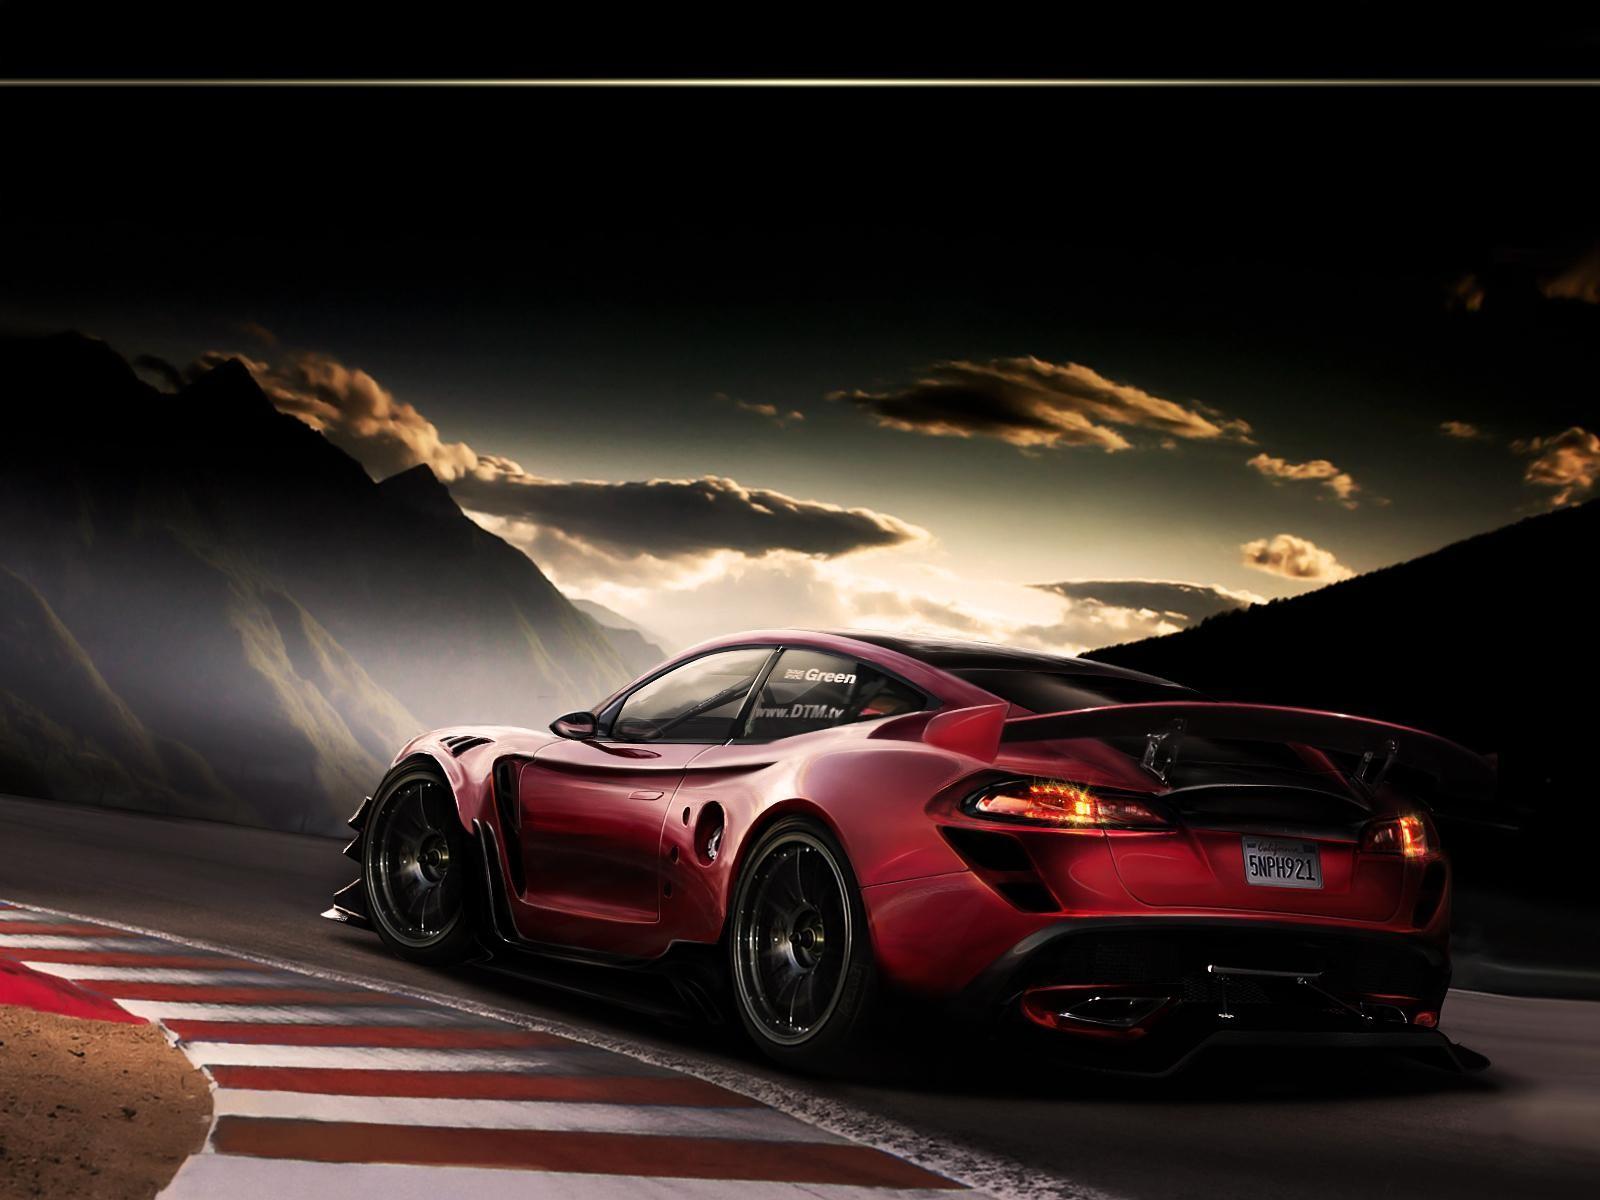 Desktop Super Hd Car Full Pics For Cars Wallpapers Pc Cool Cars